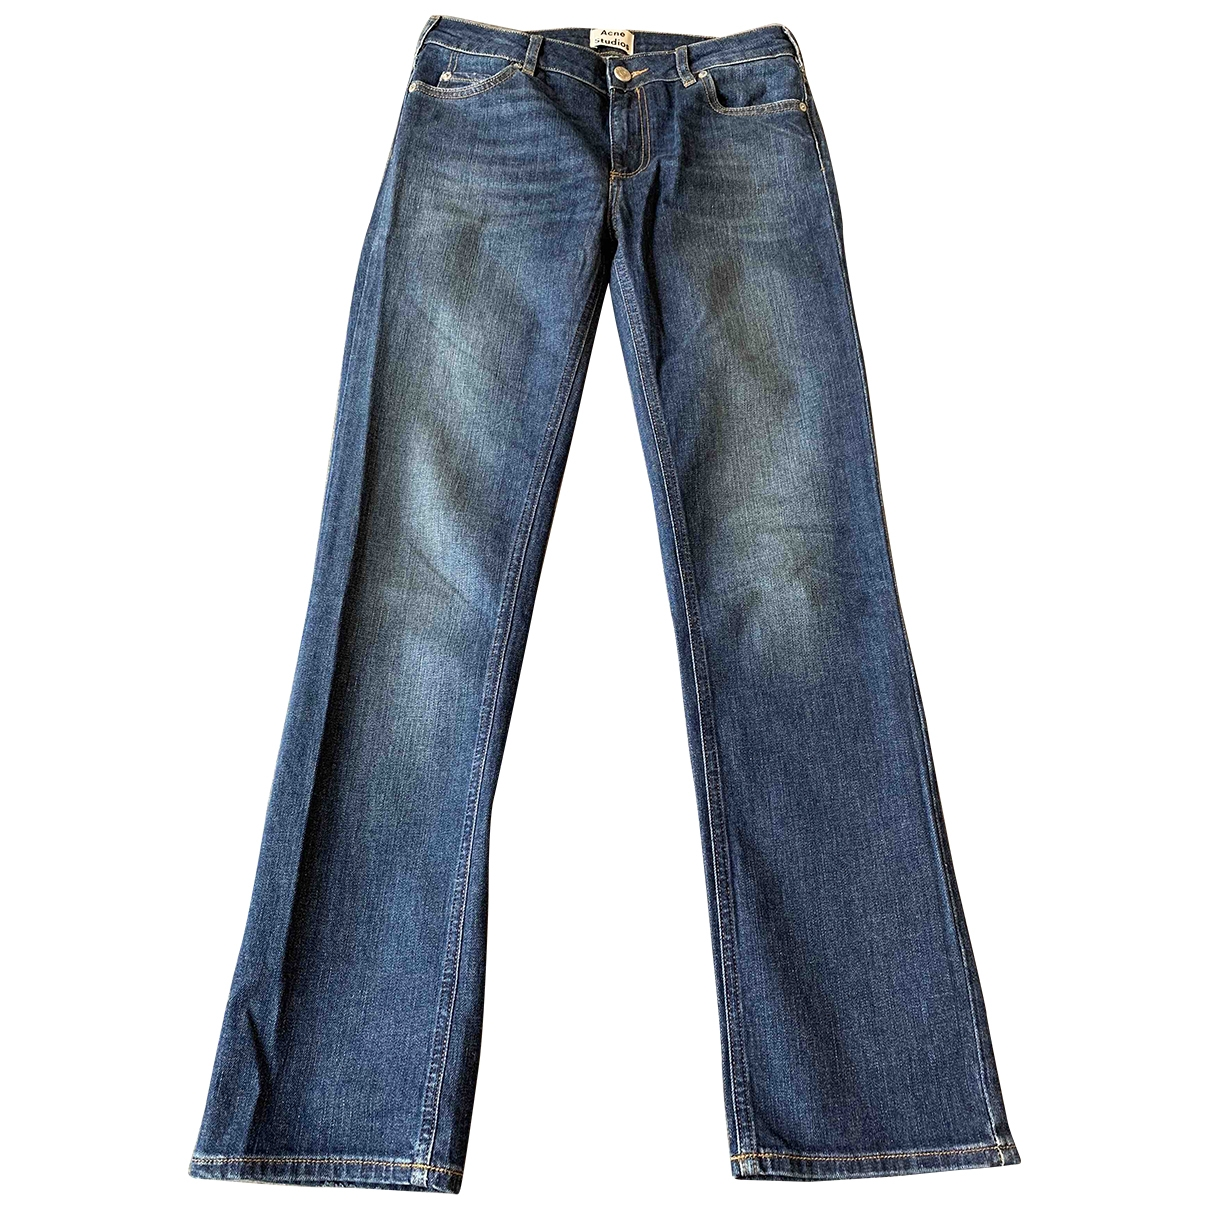 Acne Studios \N Navy Denim - Jeans Jeans for Women 28 US